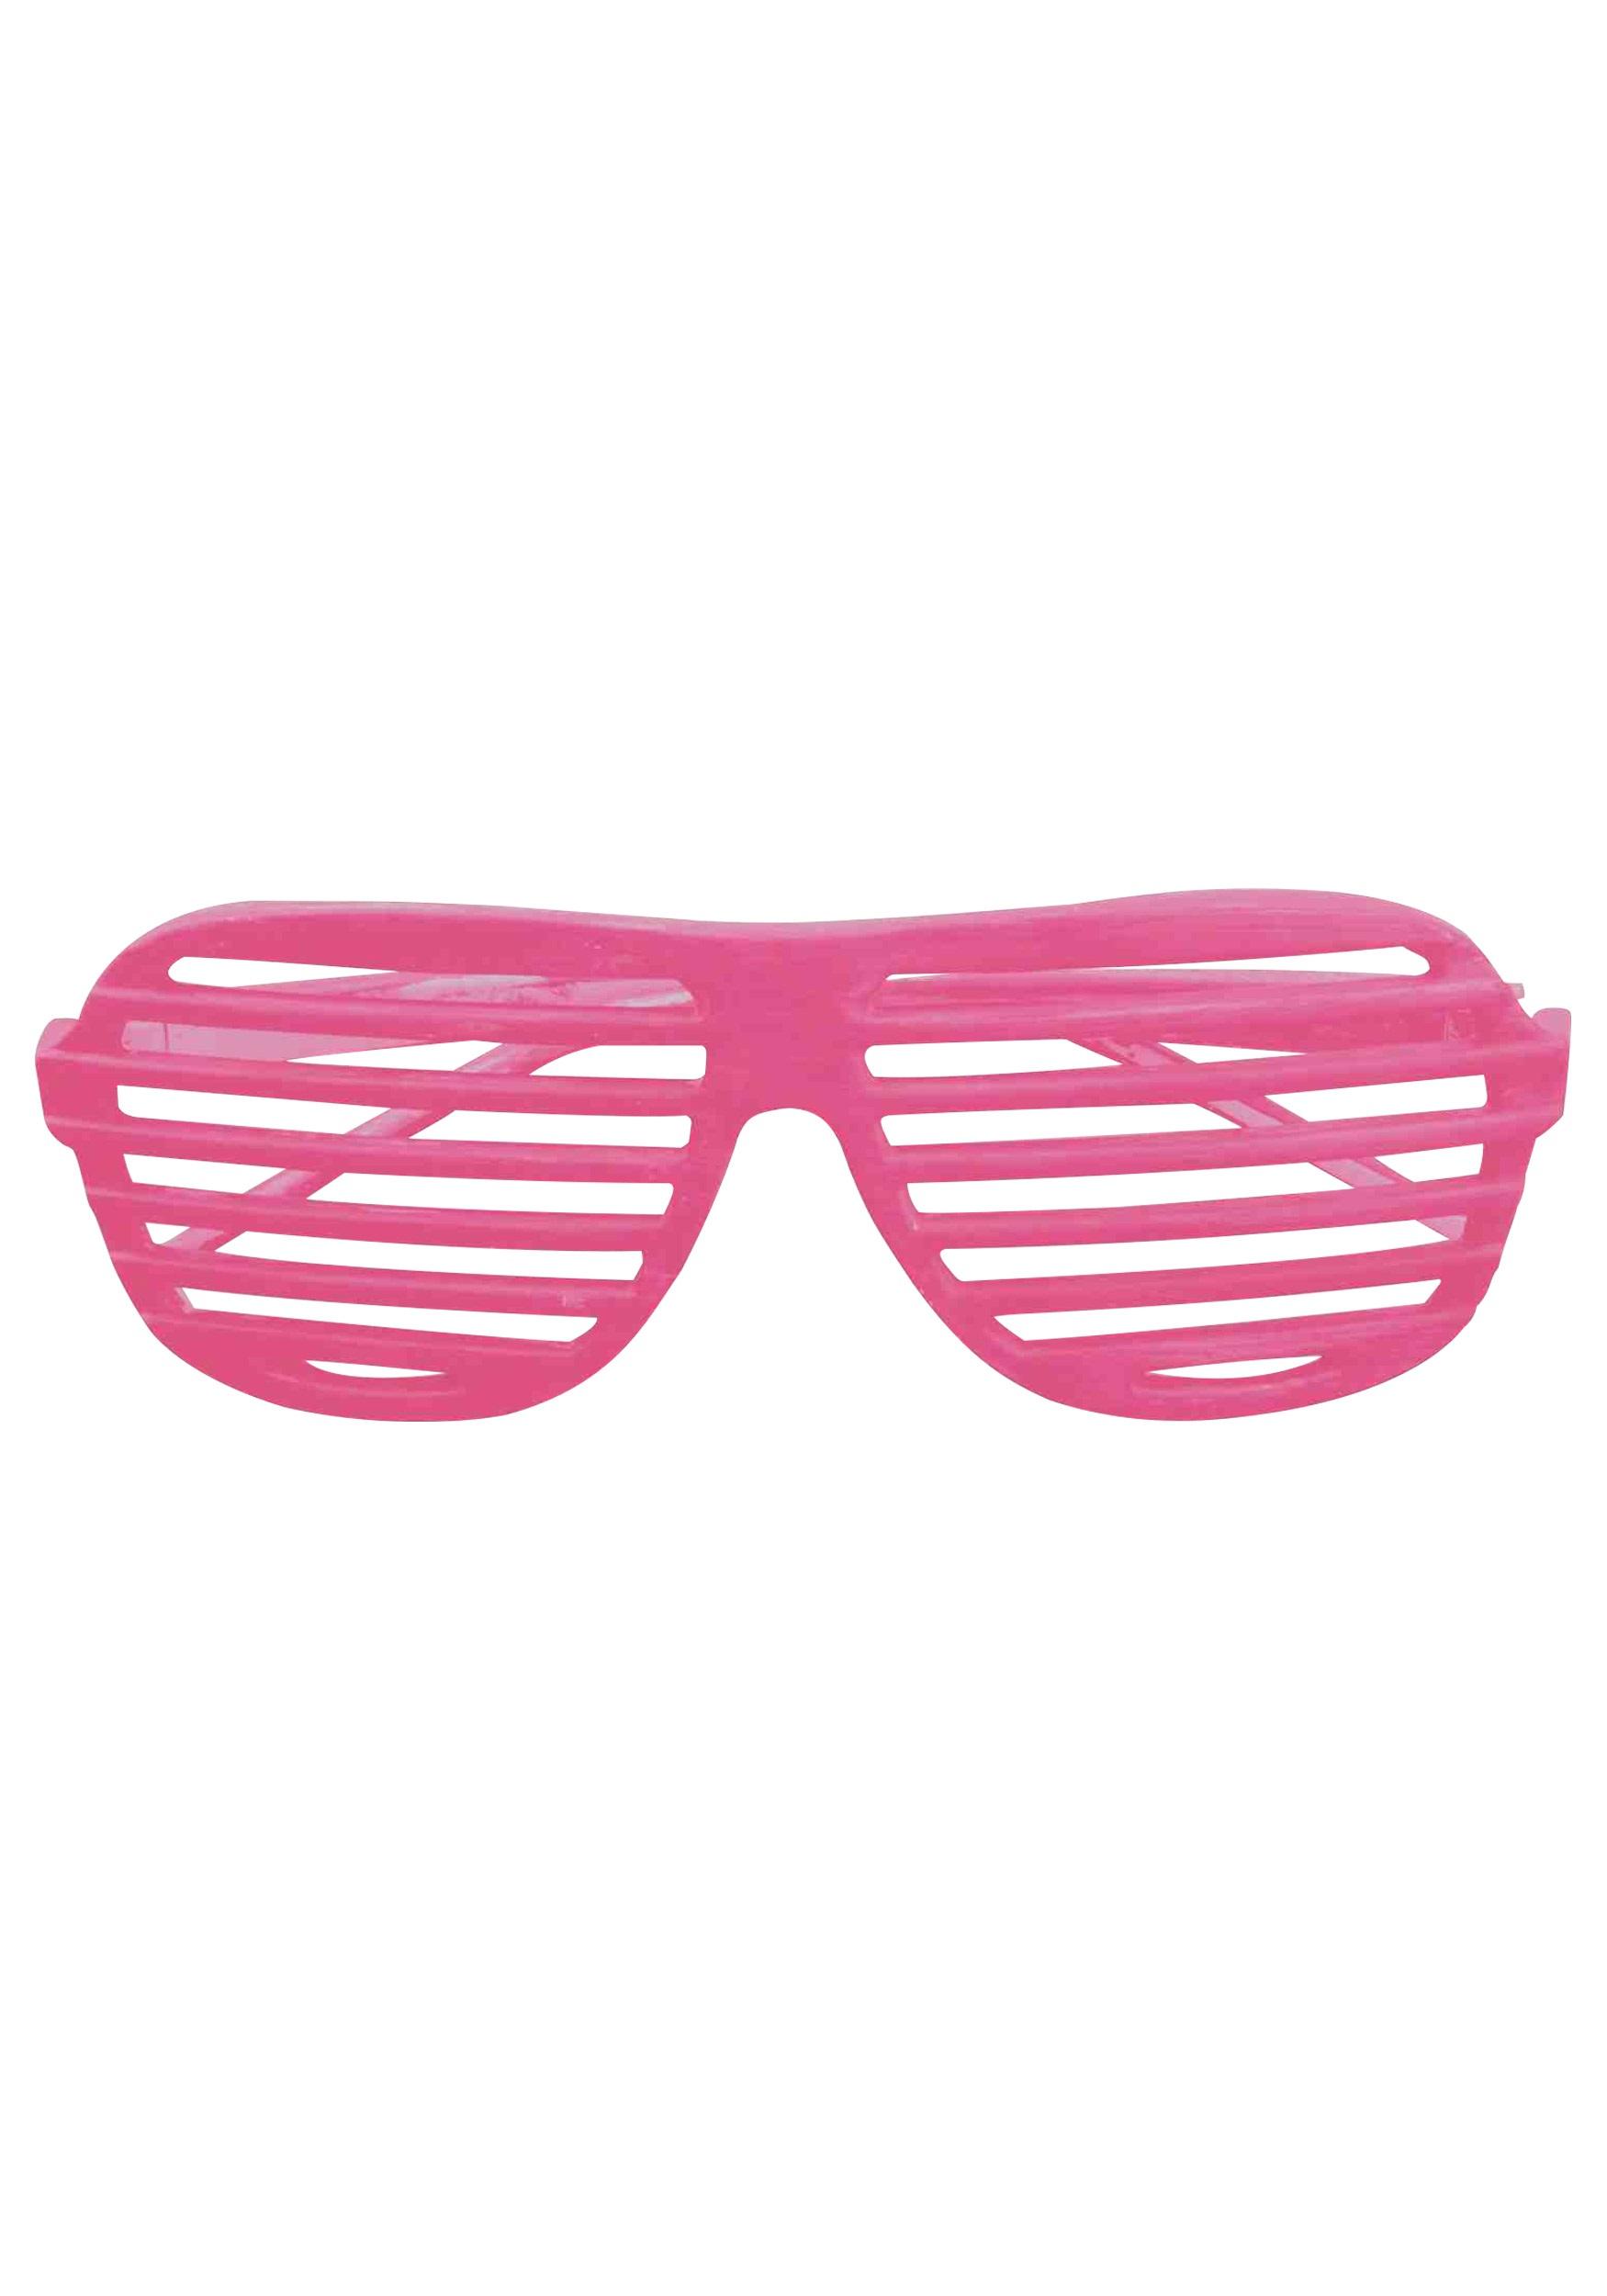 80s heartshutter glasses clipart svg freeuse stock 80\'S Sunglasses Cliparts - Cliparts Zone svg freeuse stock